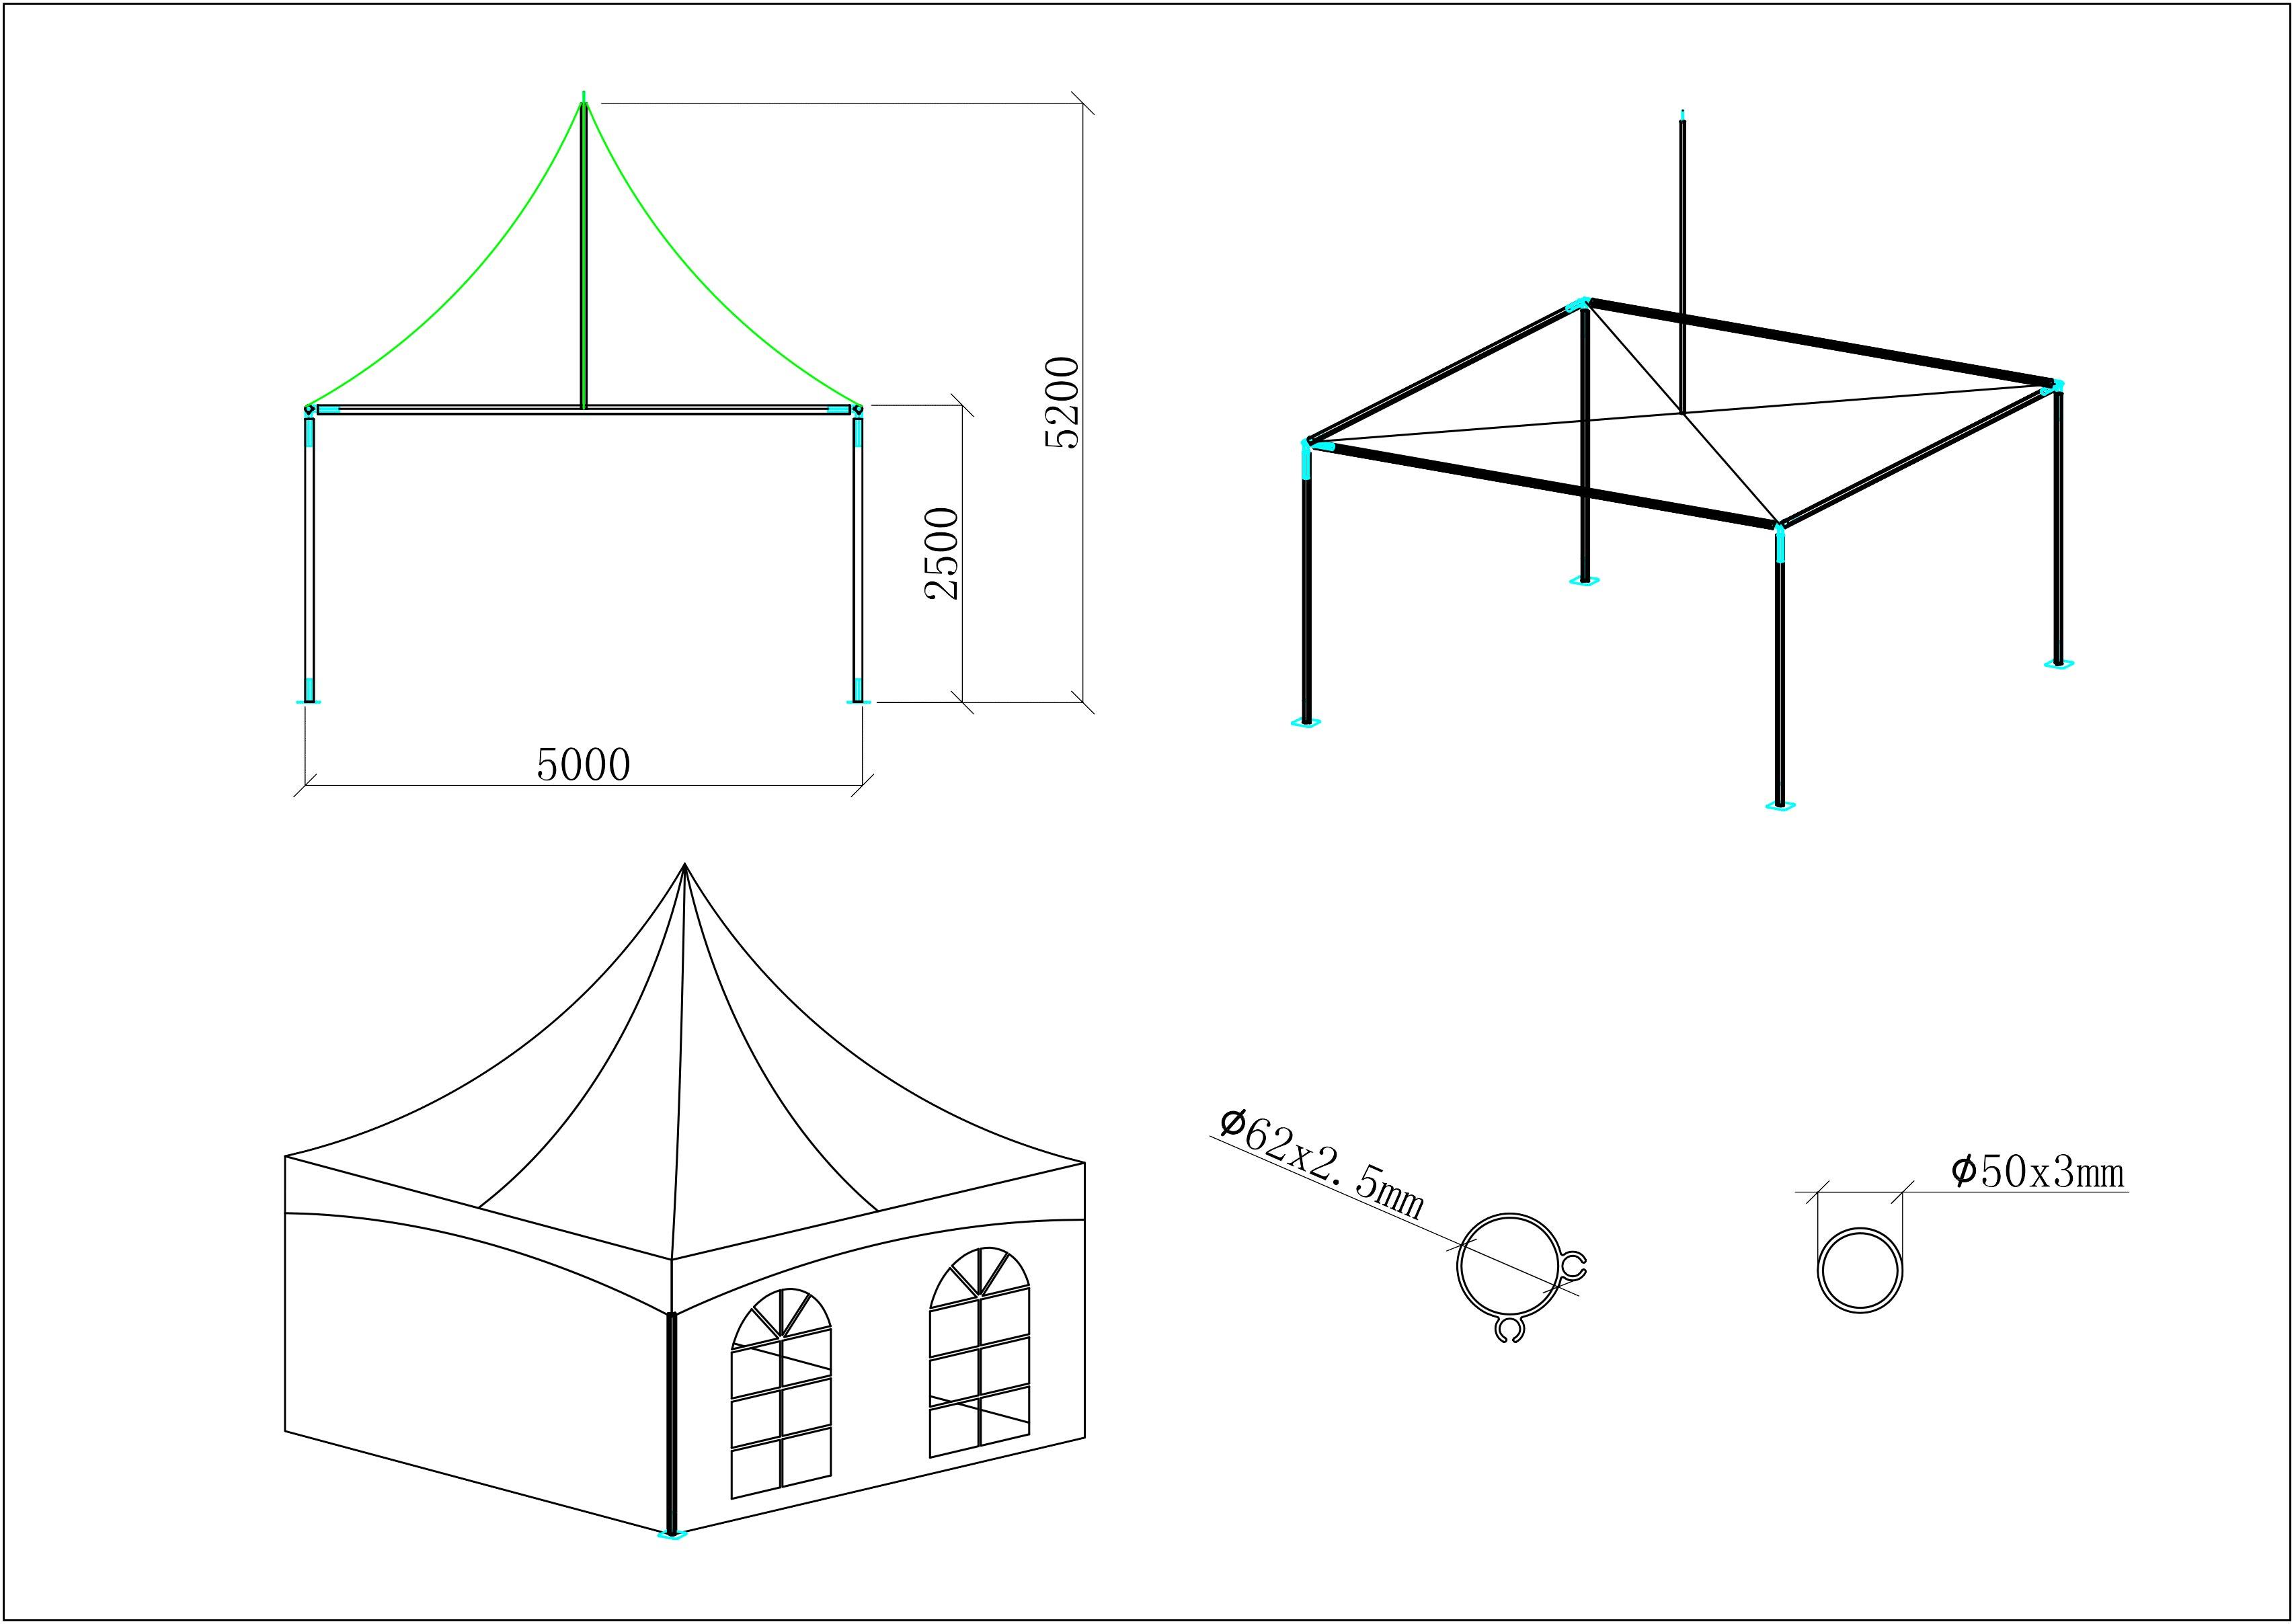 Event tent 5m